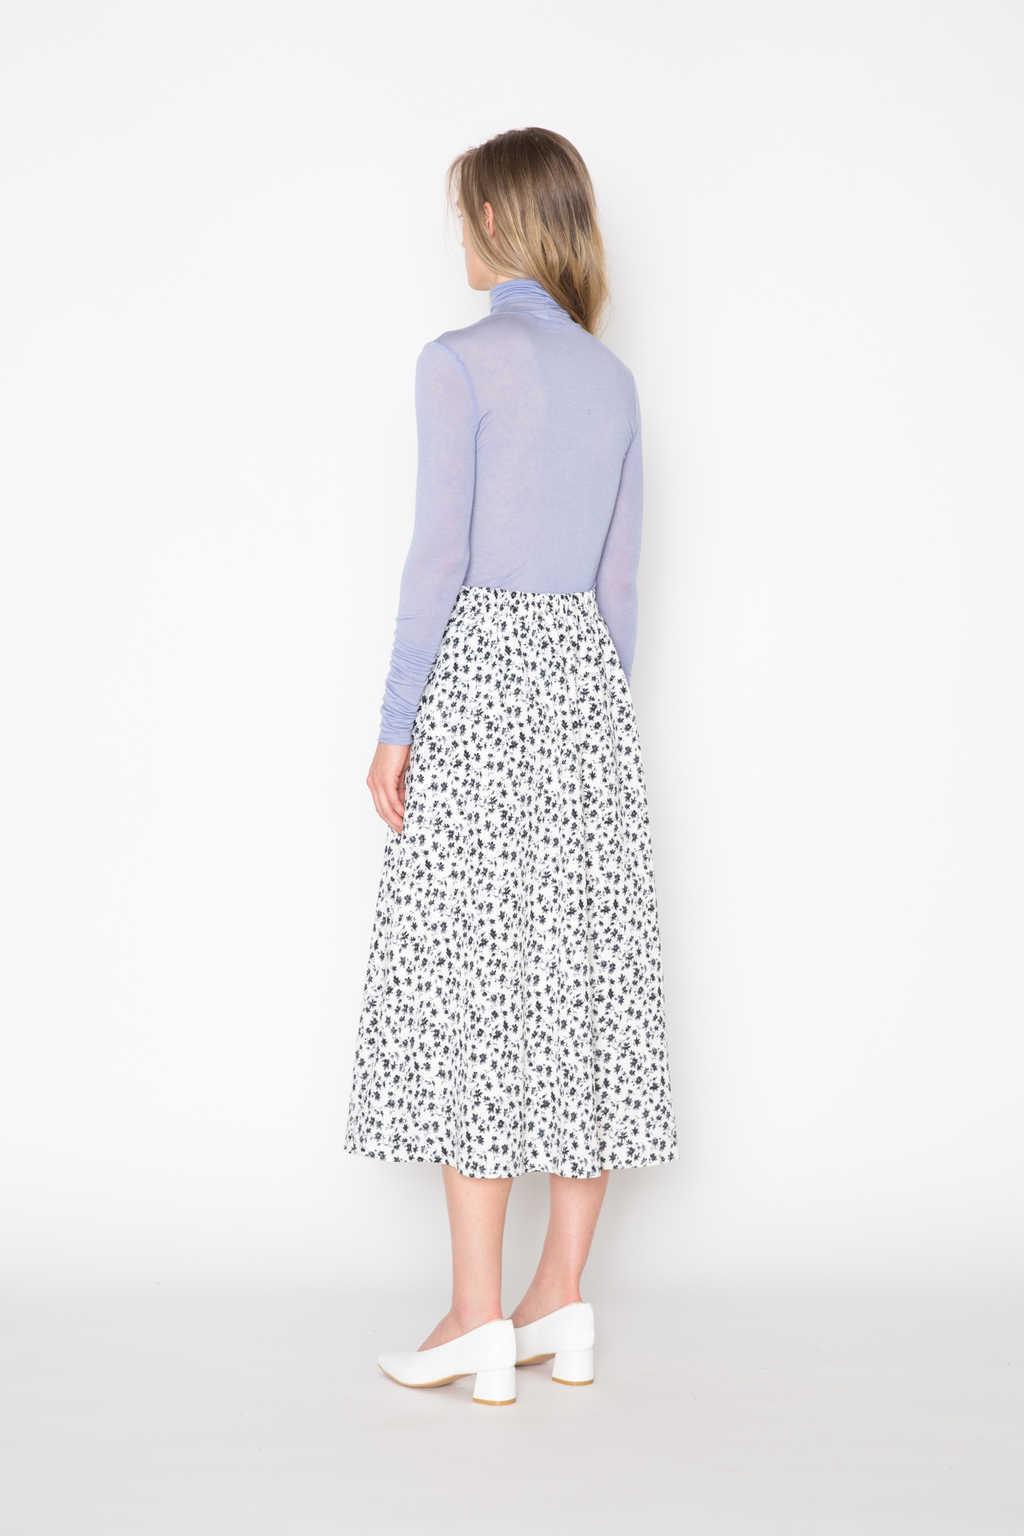 Skirt H214 Cream 4